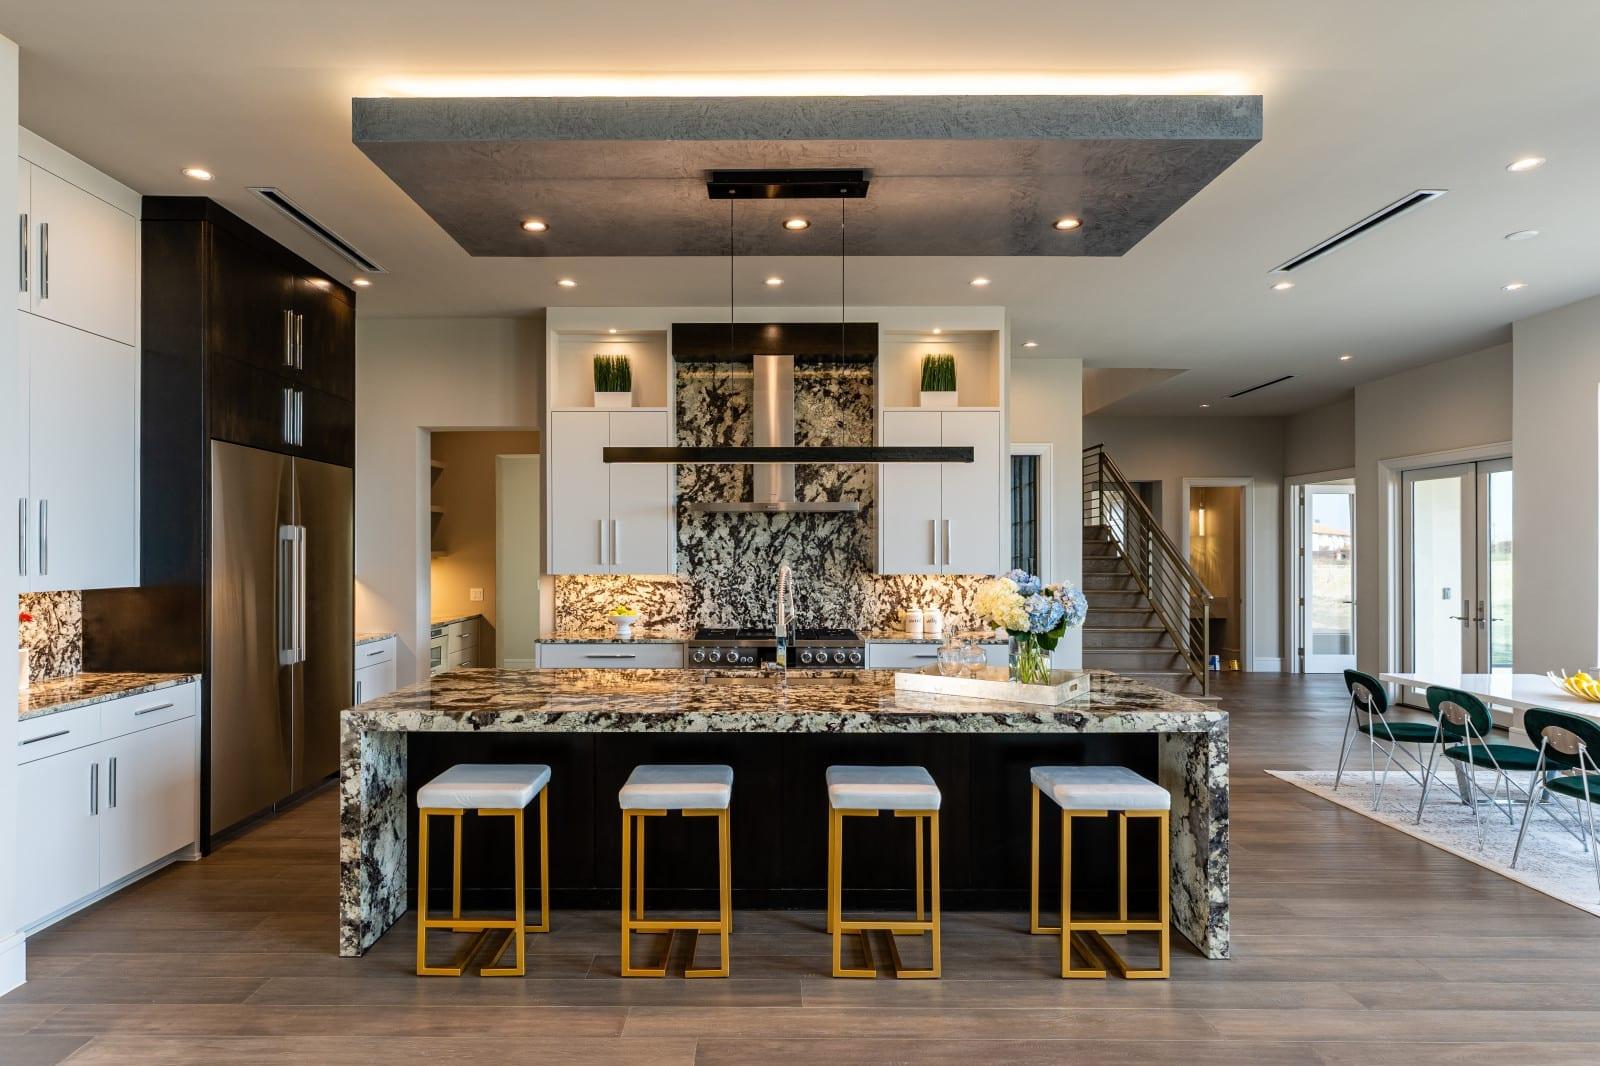 Modern Style Homes design # 1 - Millennial Design + Build